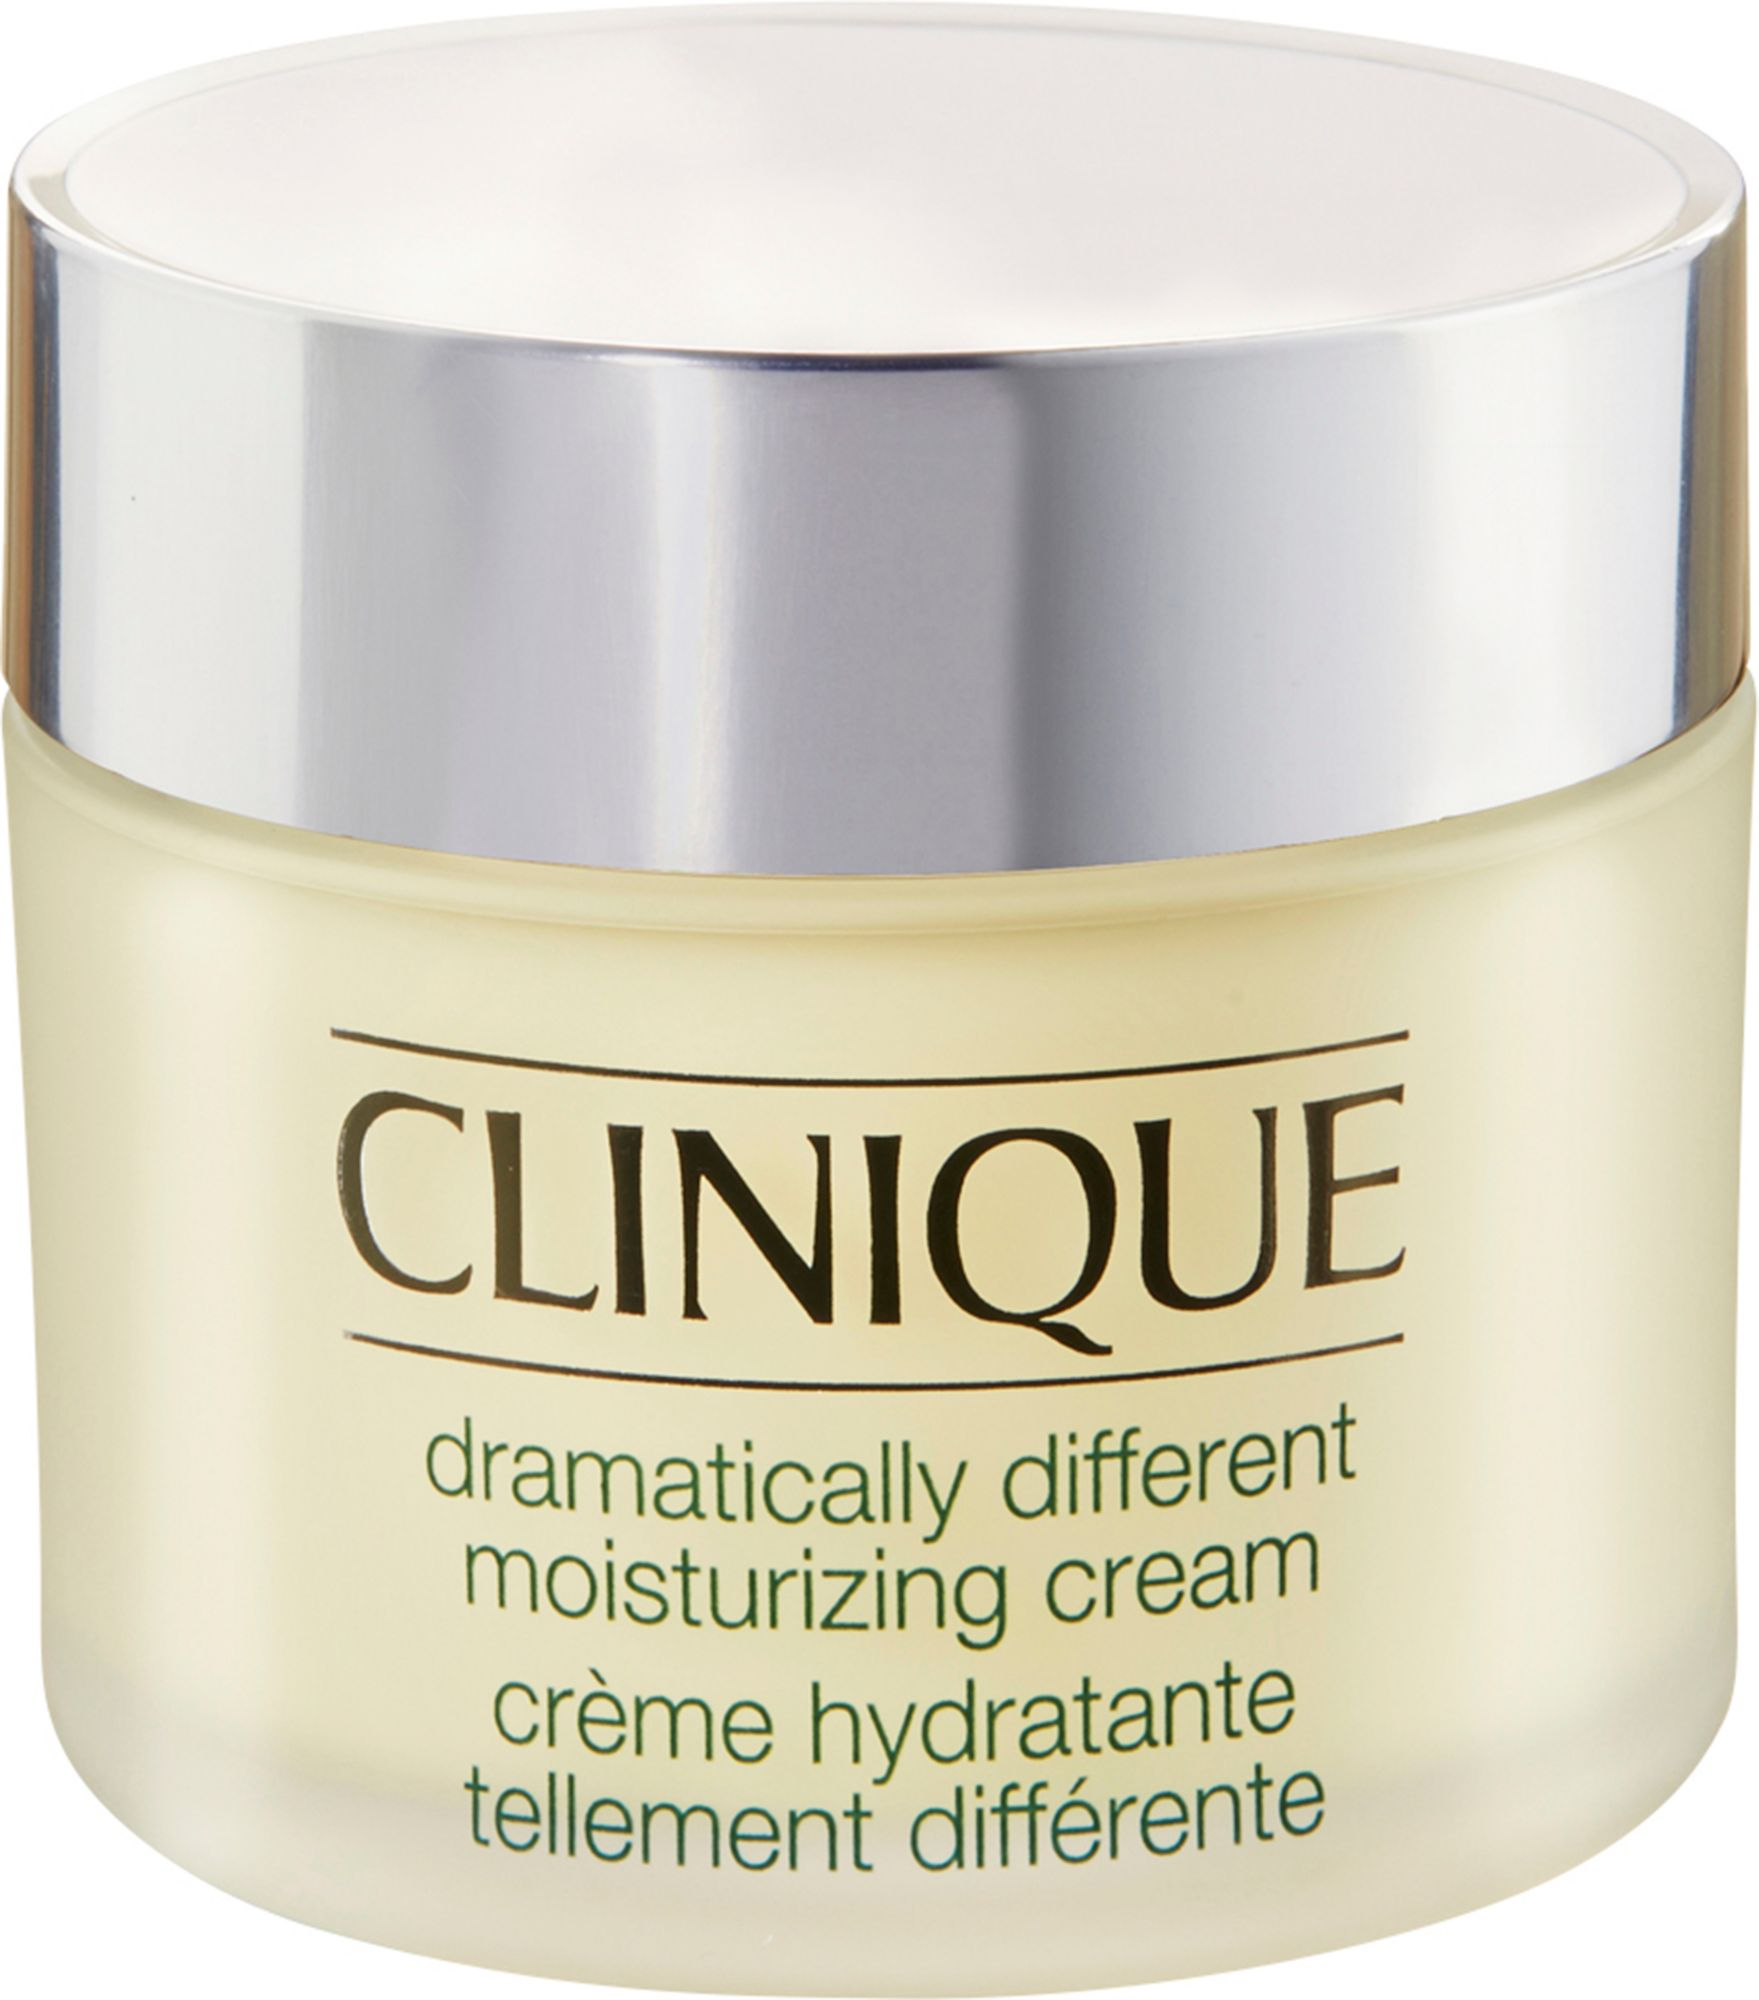 CLINIQUE Clinique, »Dramatically Different Moisturizing Cream«, Feuchtigkeitspflege